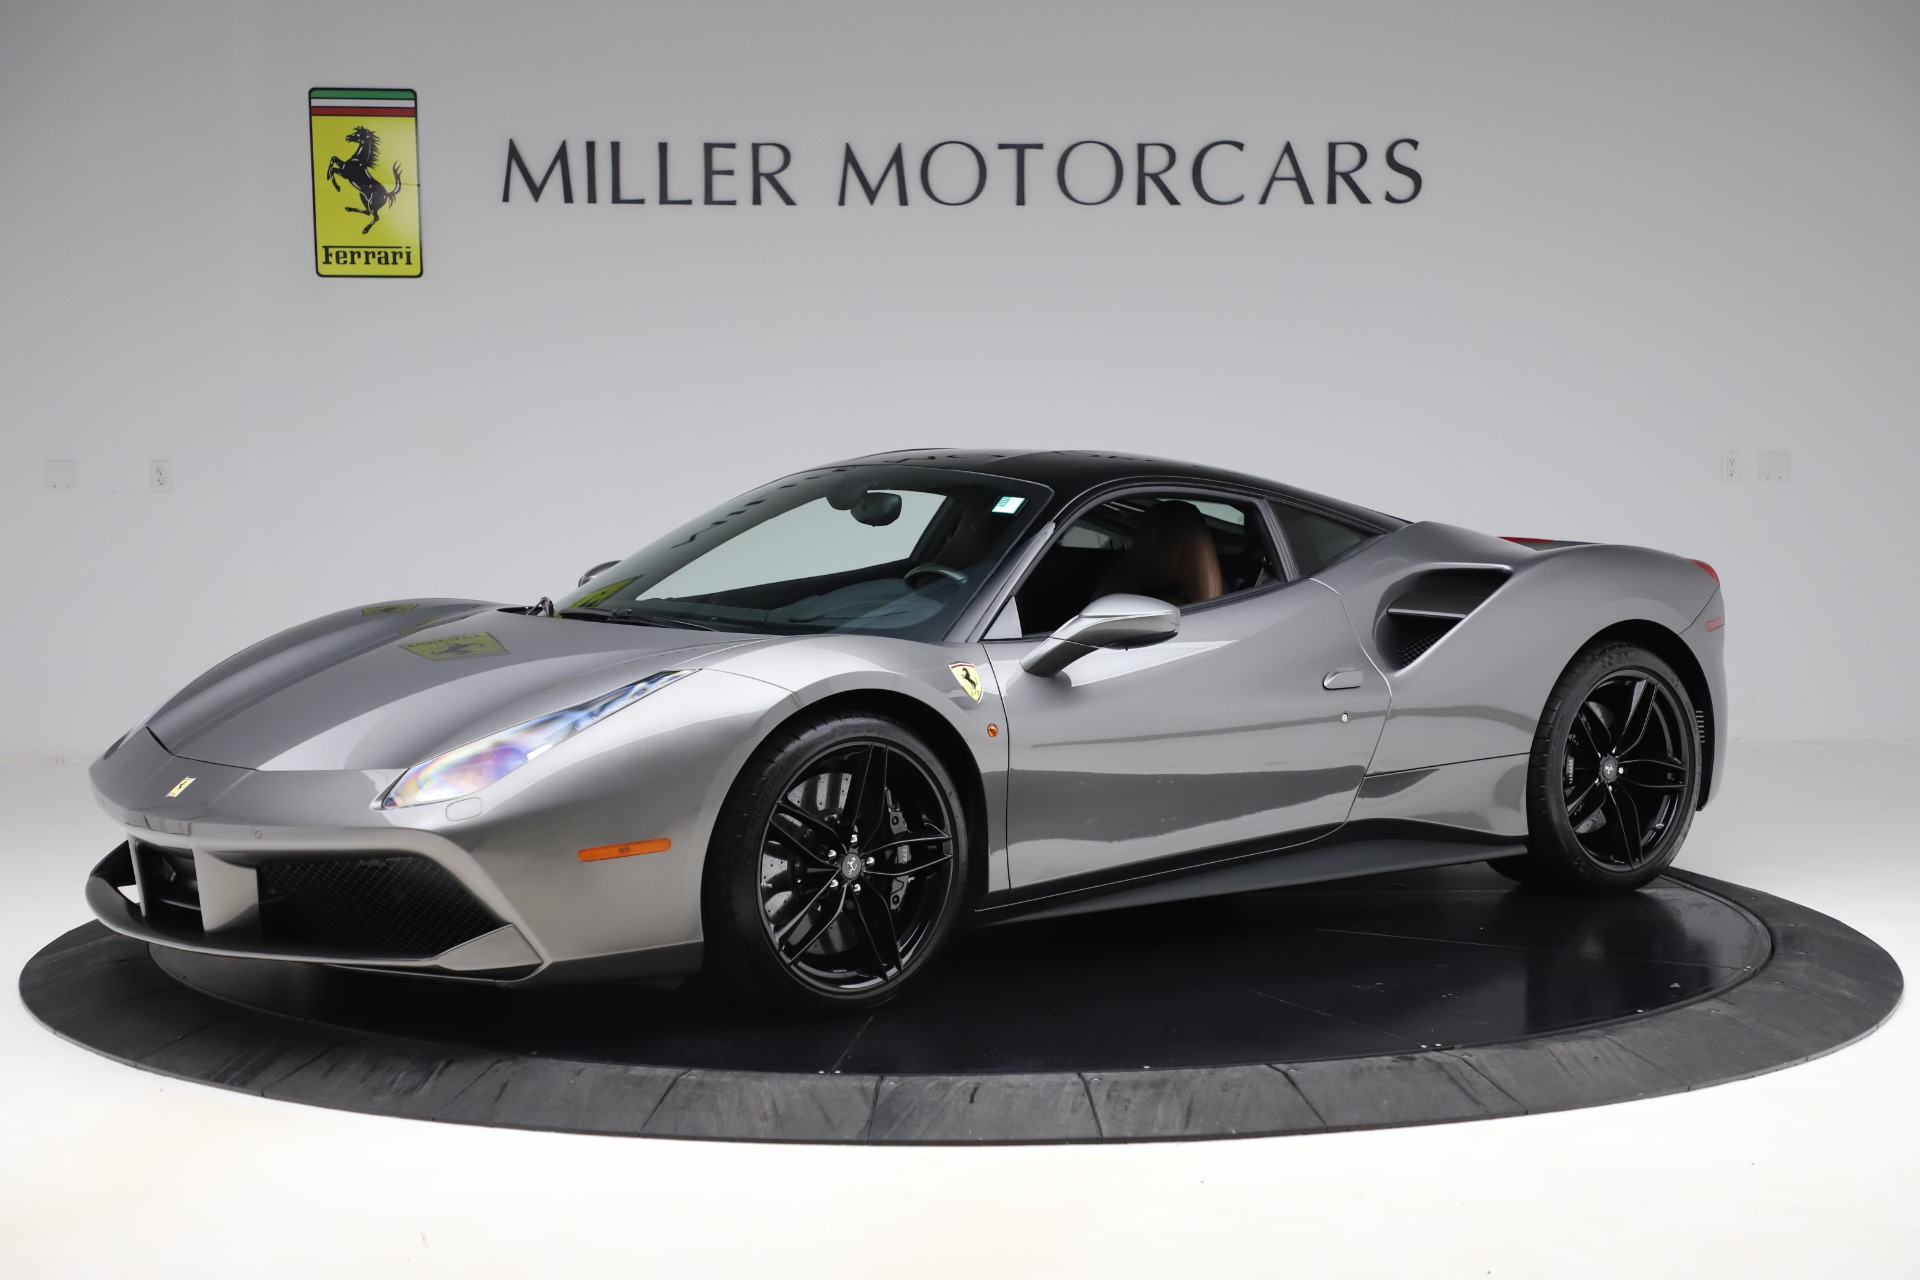 Pre Owned 2016 Ferrari 488 Gtb For Sale 242 900 Mclaren Greenwich Stock 4616